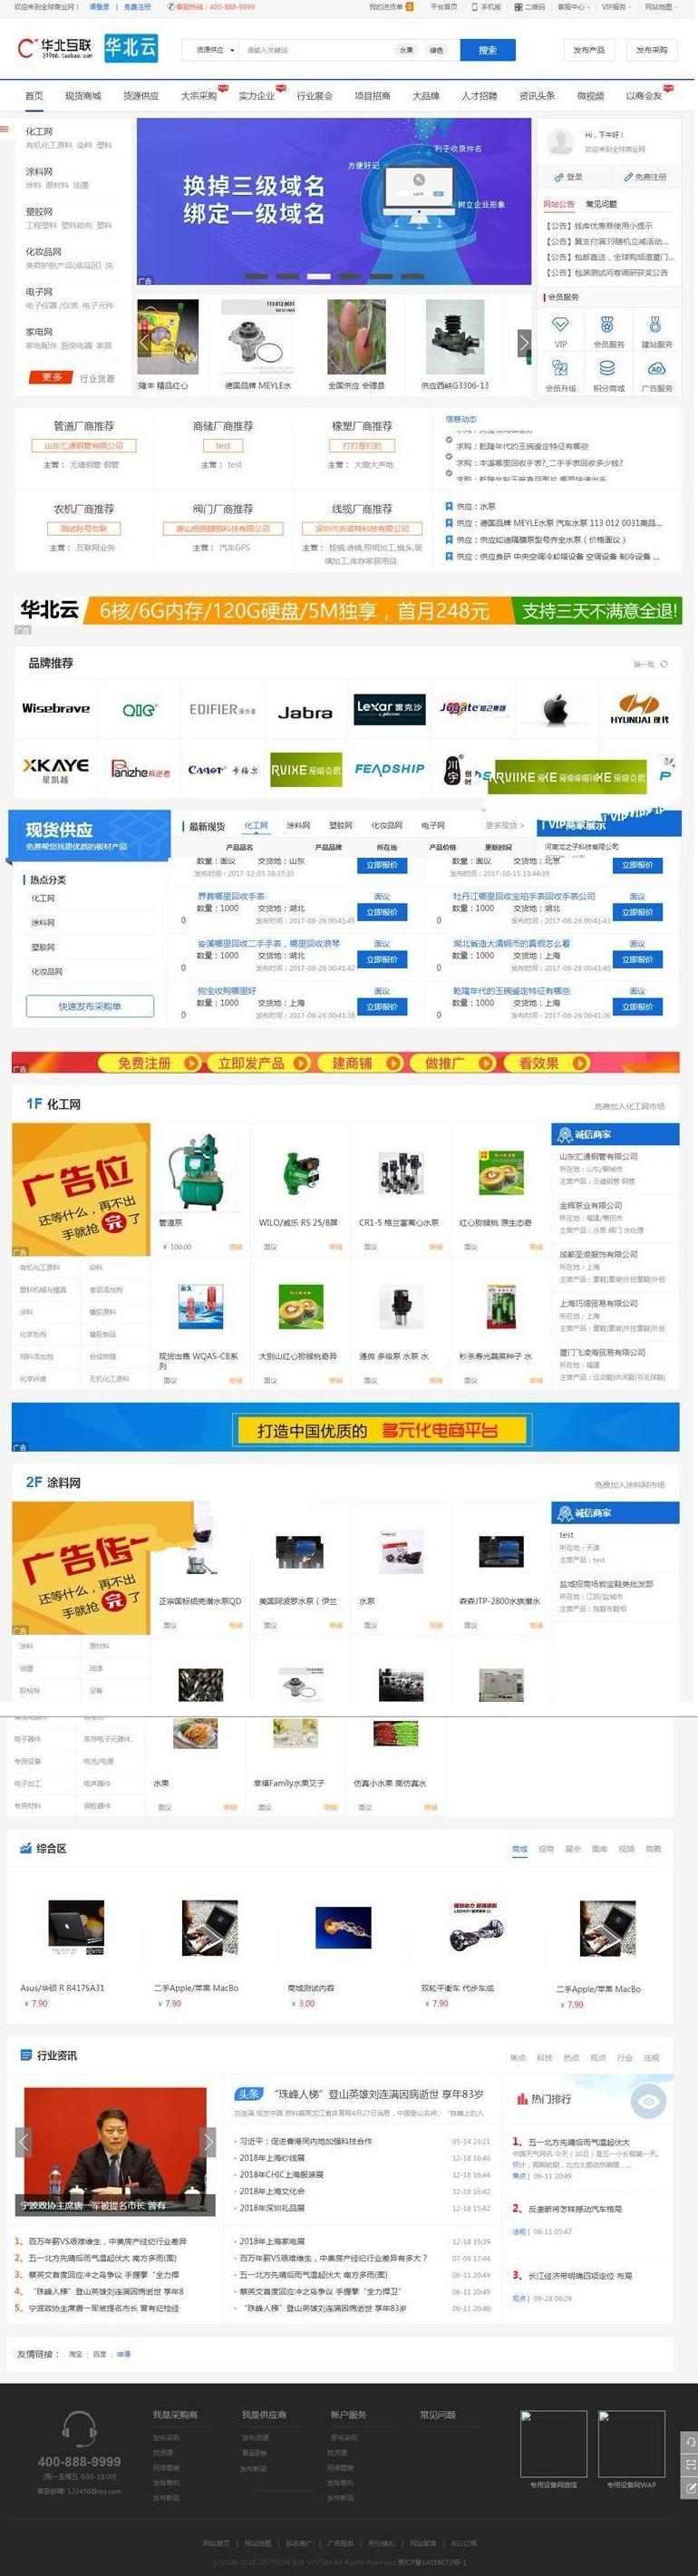 destoon7.0蓝色大型宽屏行业门户网站模板整站带数据带手机模板 第1张